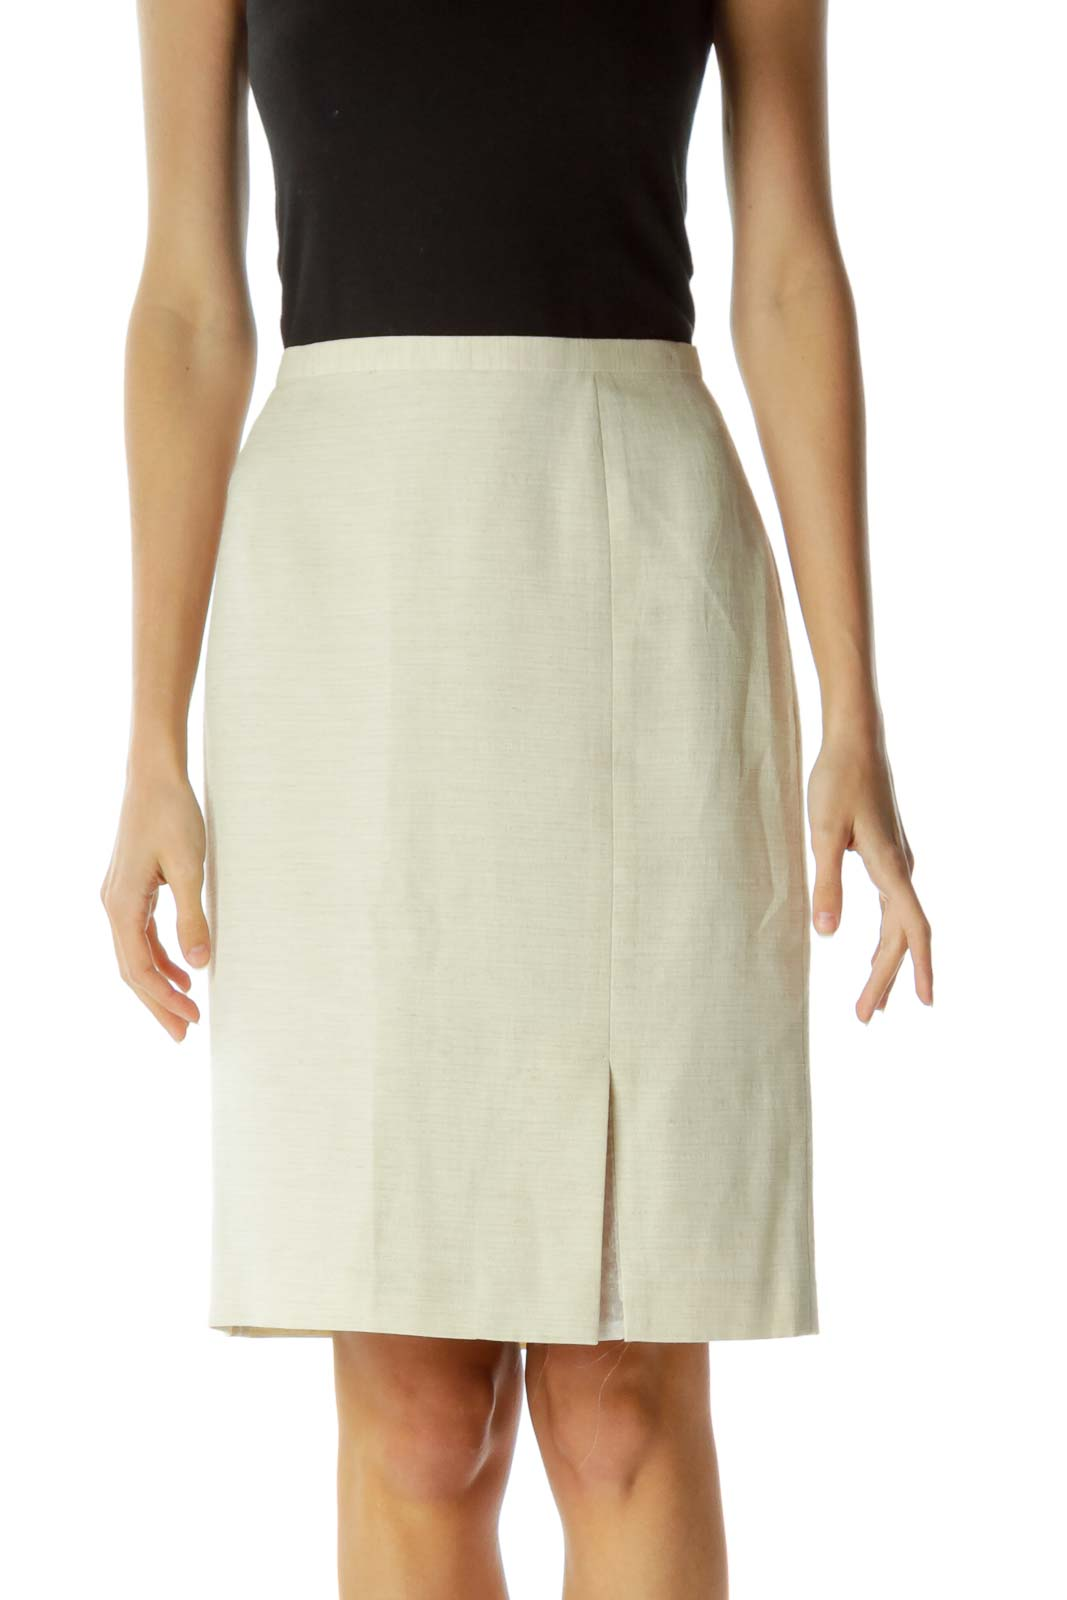 Cream A-Line Skirt with Sheer Slit